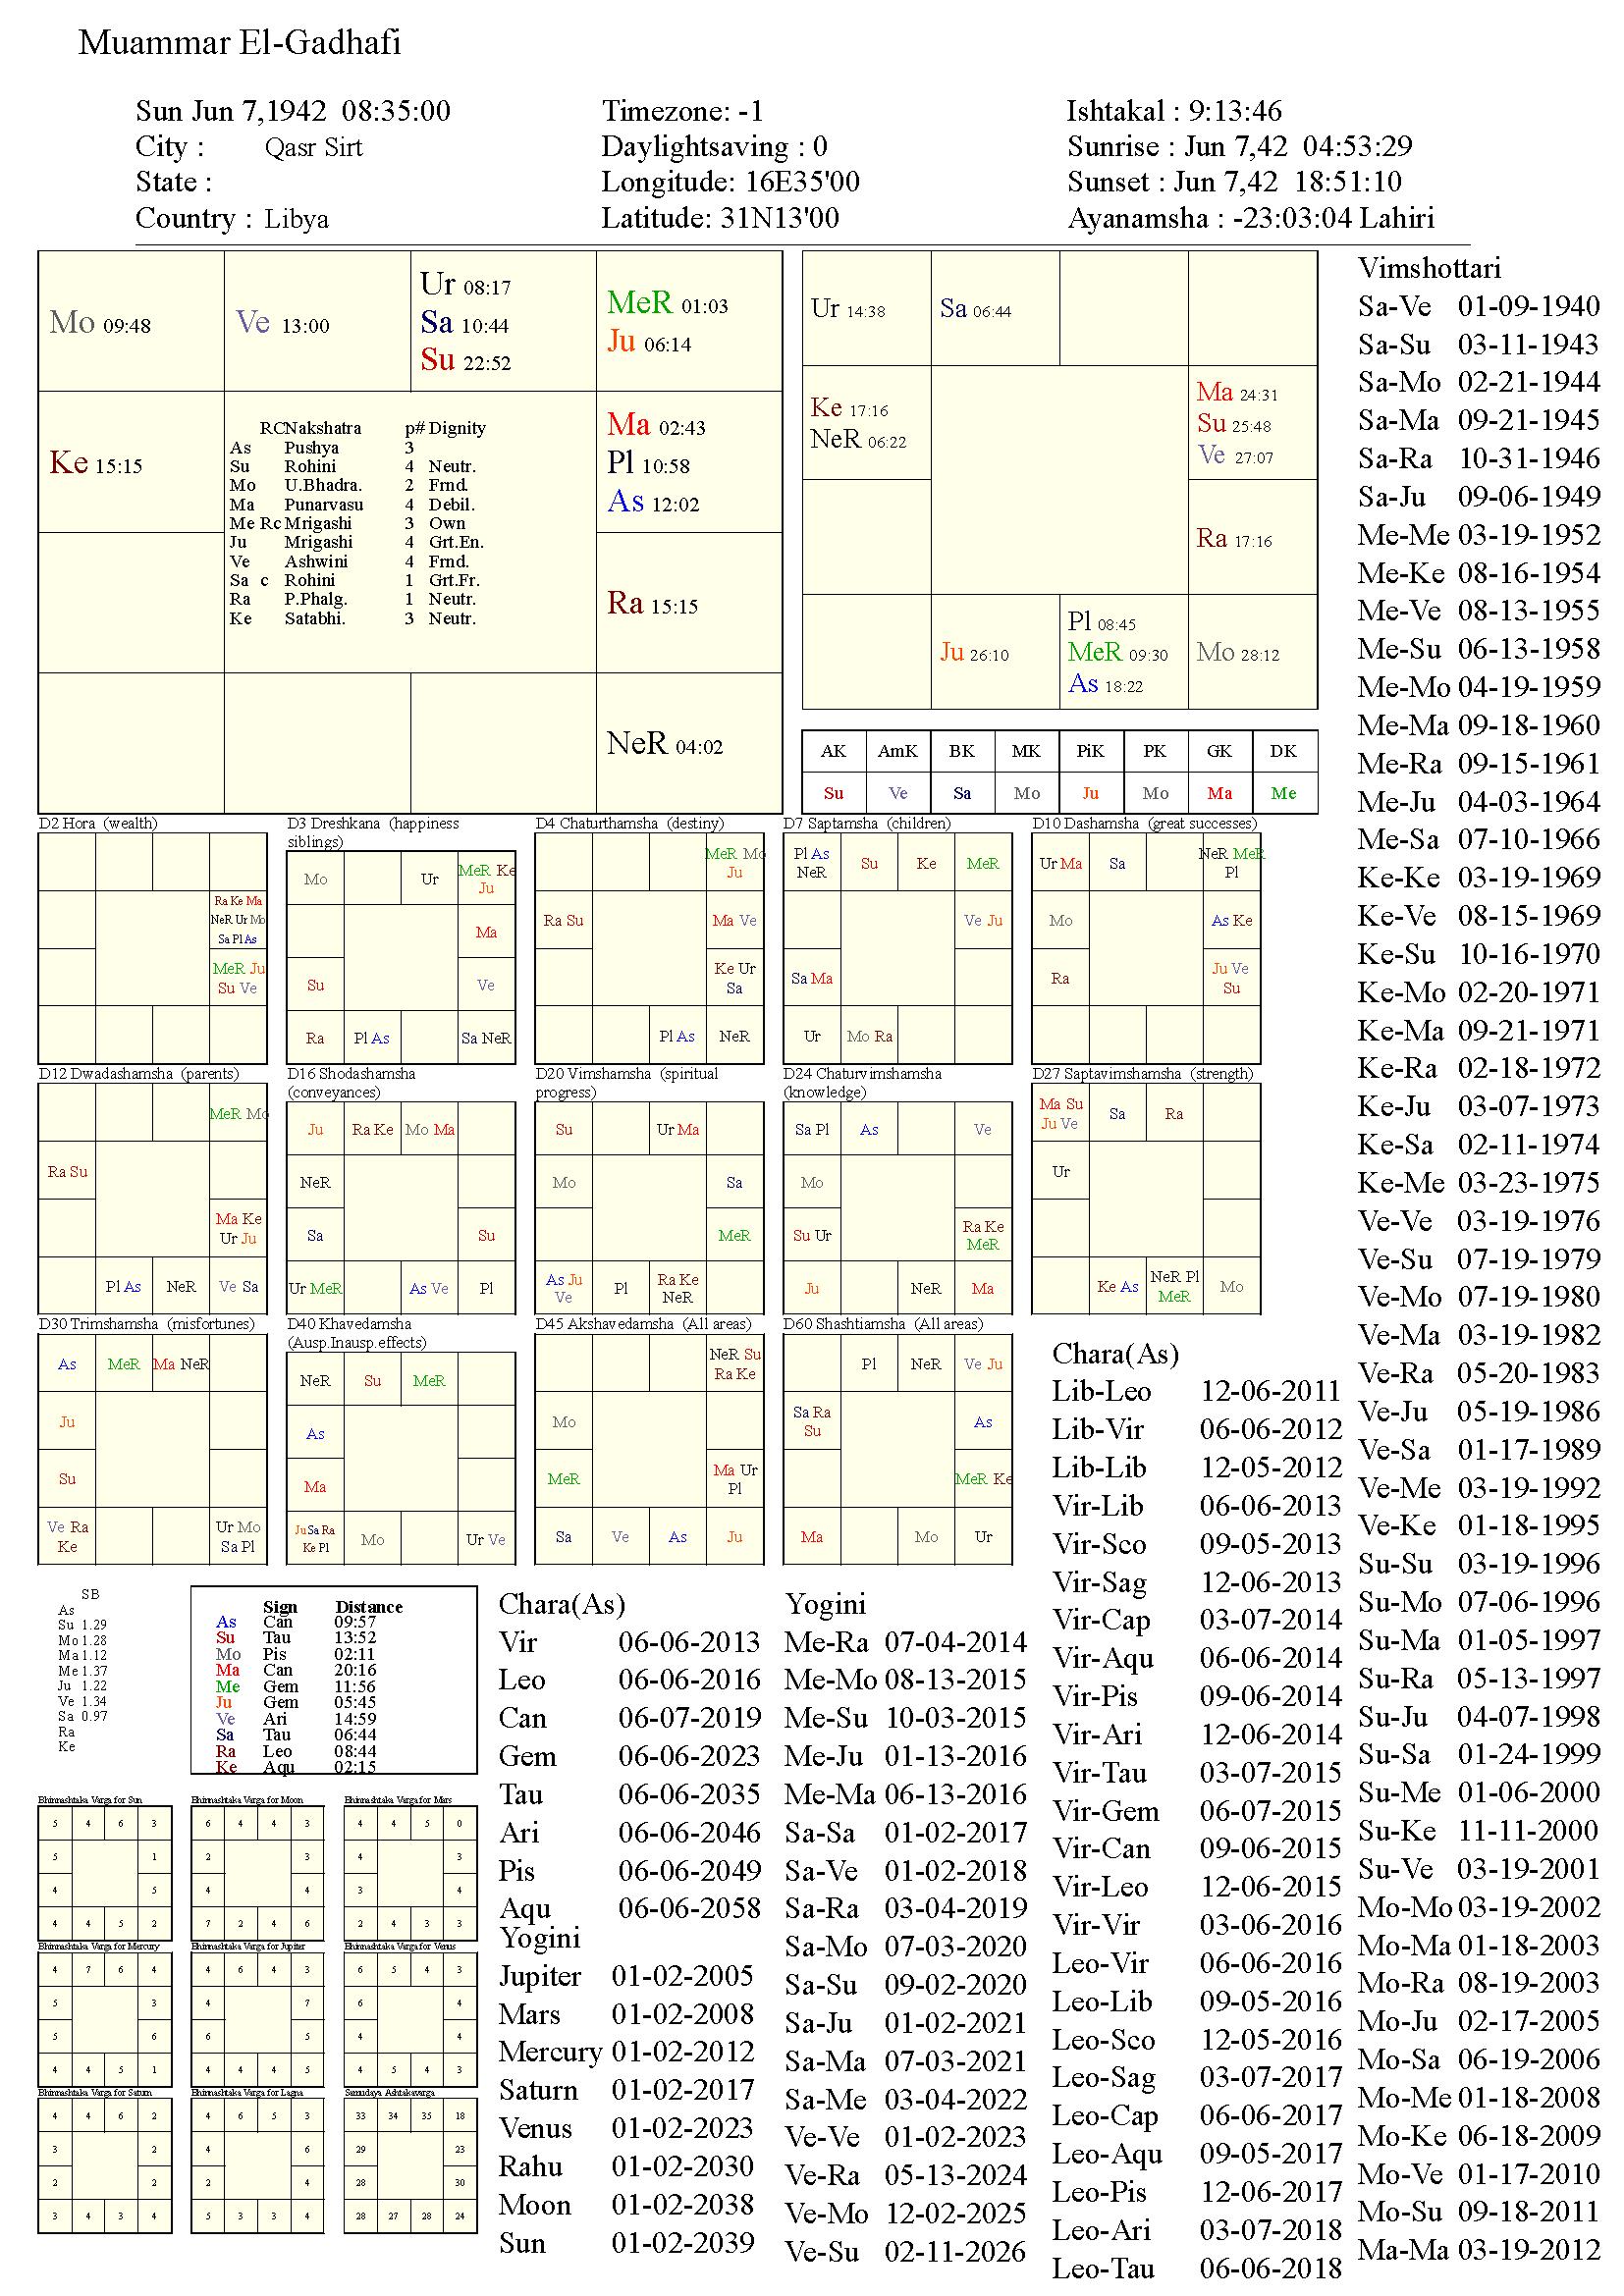 MuammarEl-Gadhafi_chart